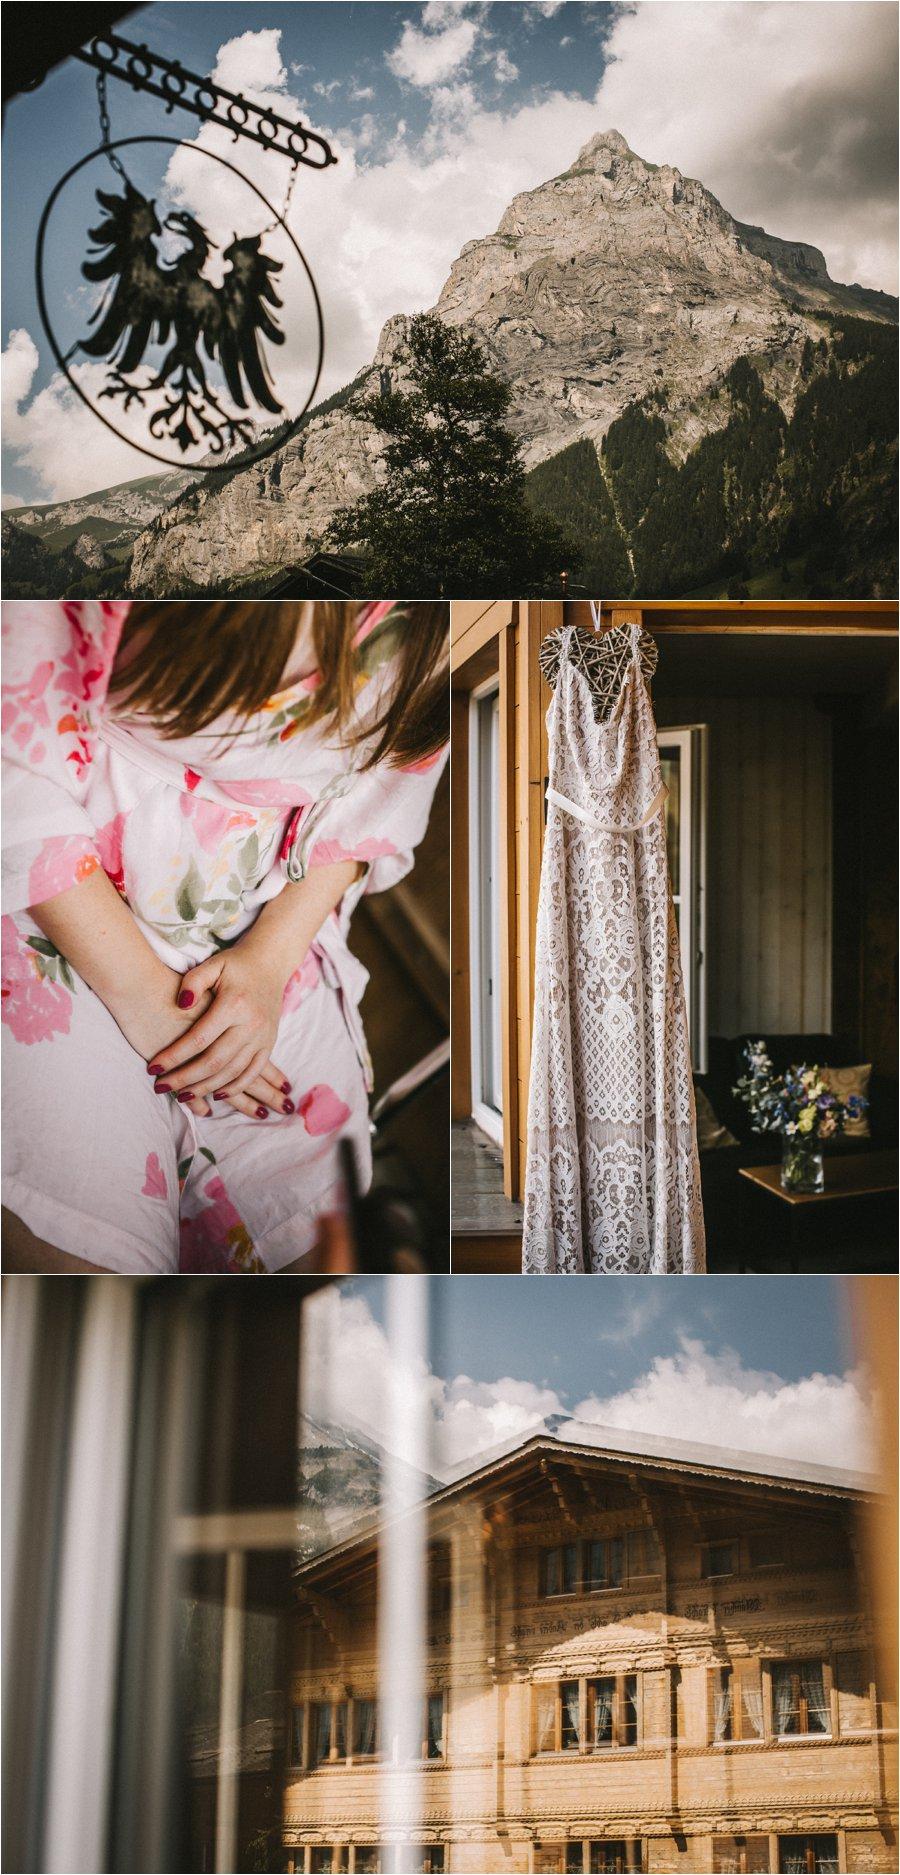 Swiss elopement bridal preparations by Bendik Photography